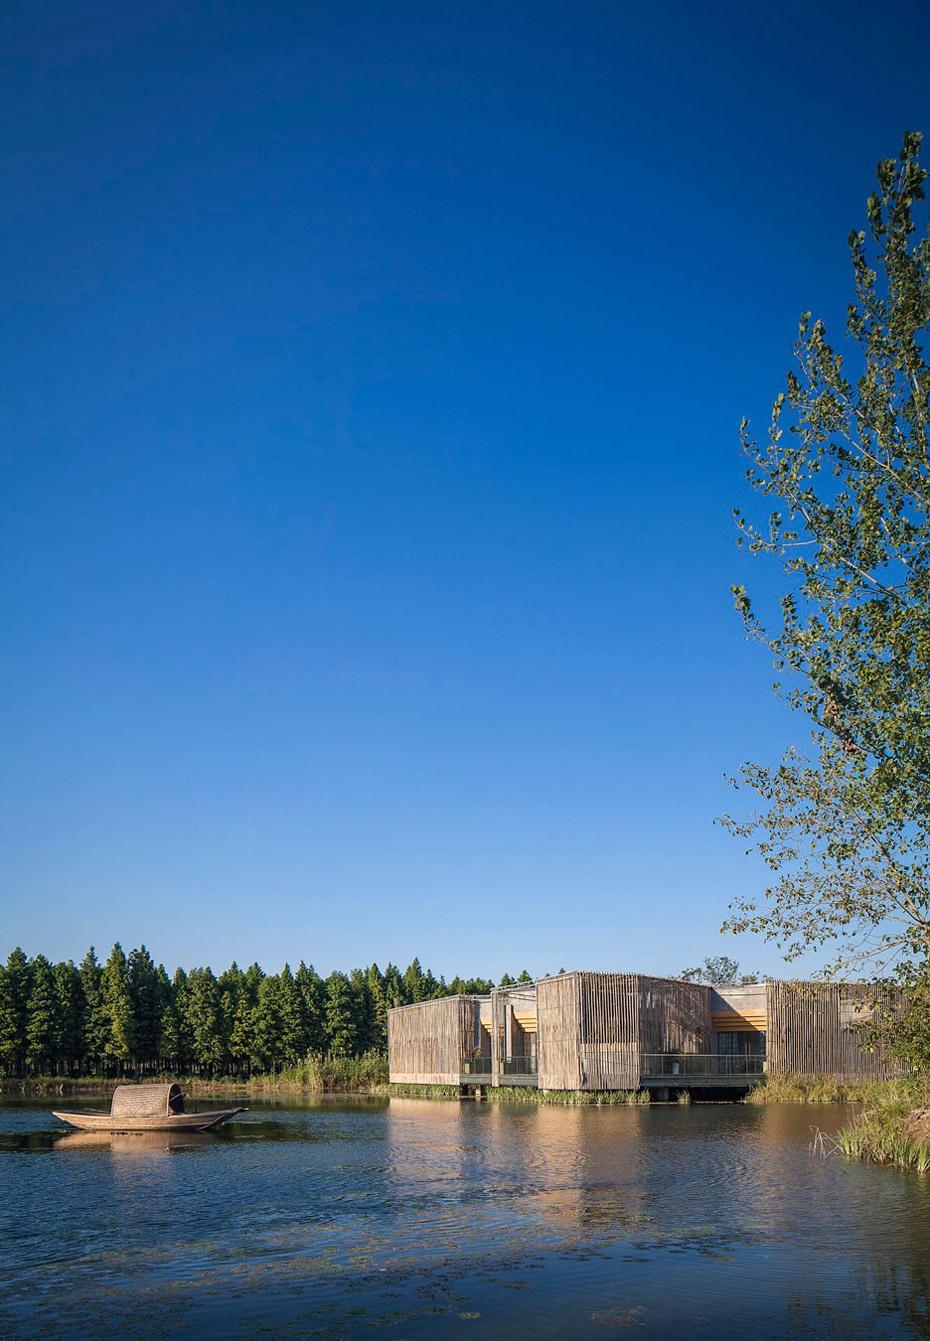 Lake, Floating Bamboo Courtyard Teahouse in ShiQiao, China